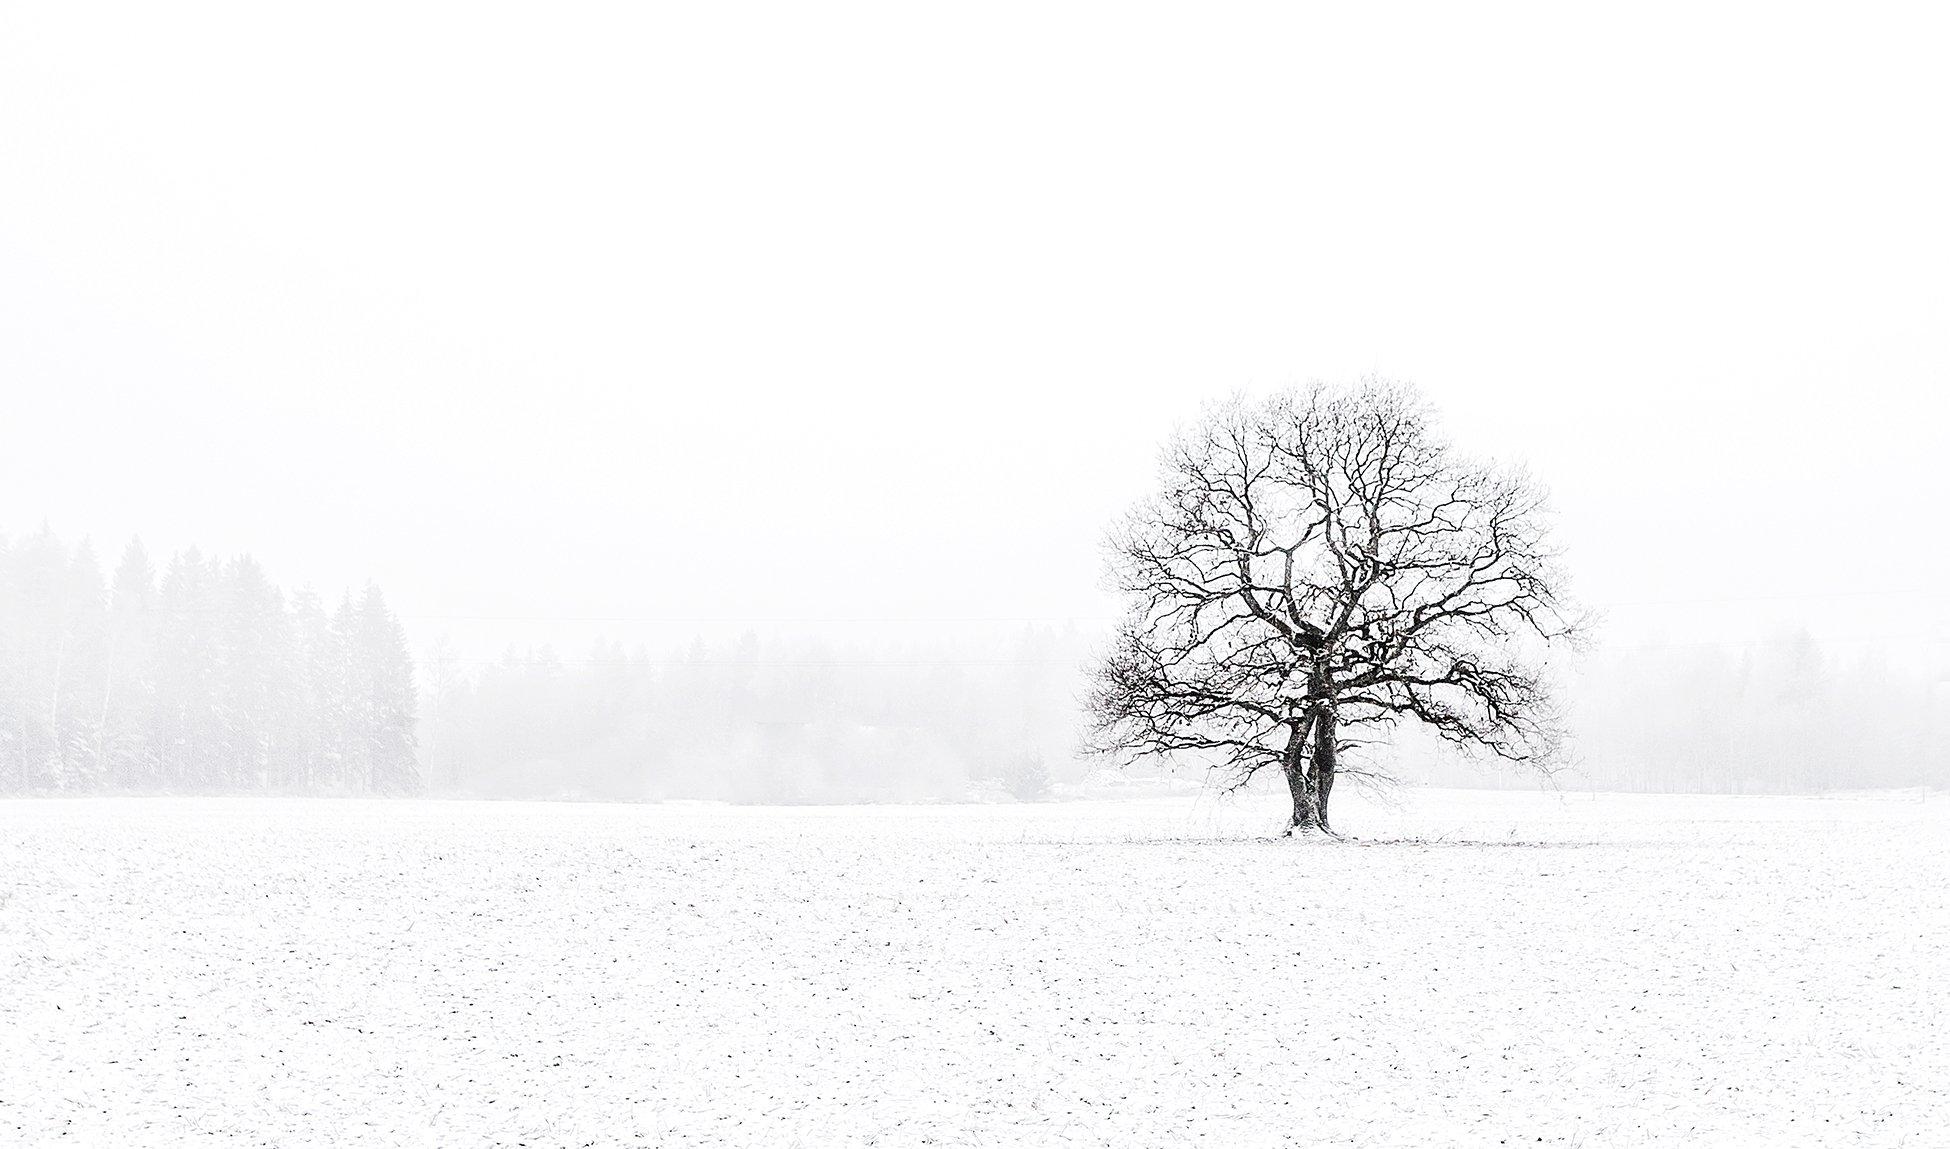 2014, Дерево, Зима, Контраст, Снег, Эстония, Kljuchenkow Aleksandr